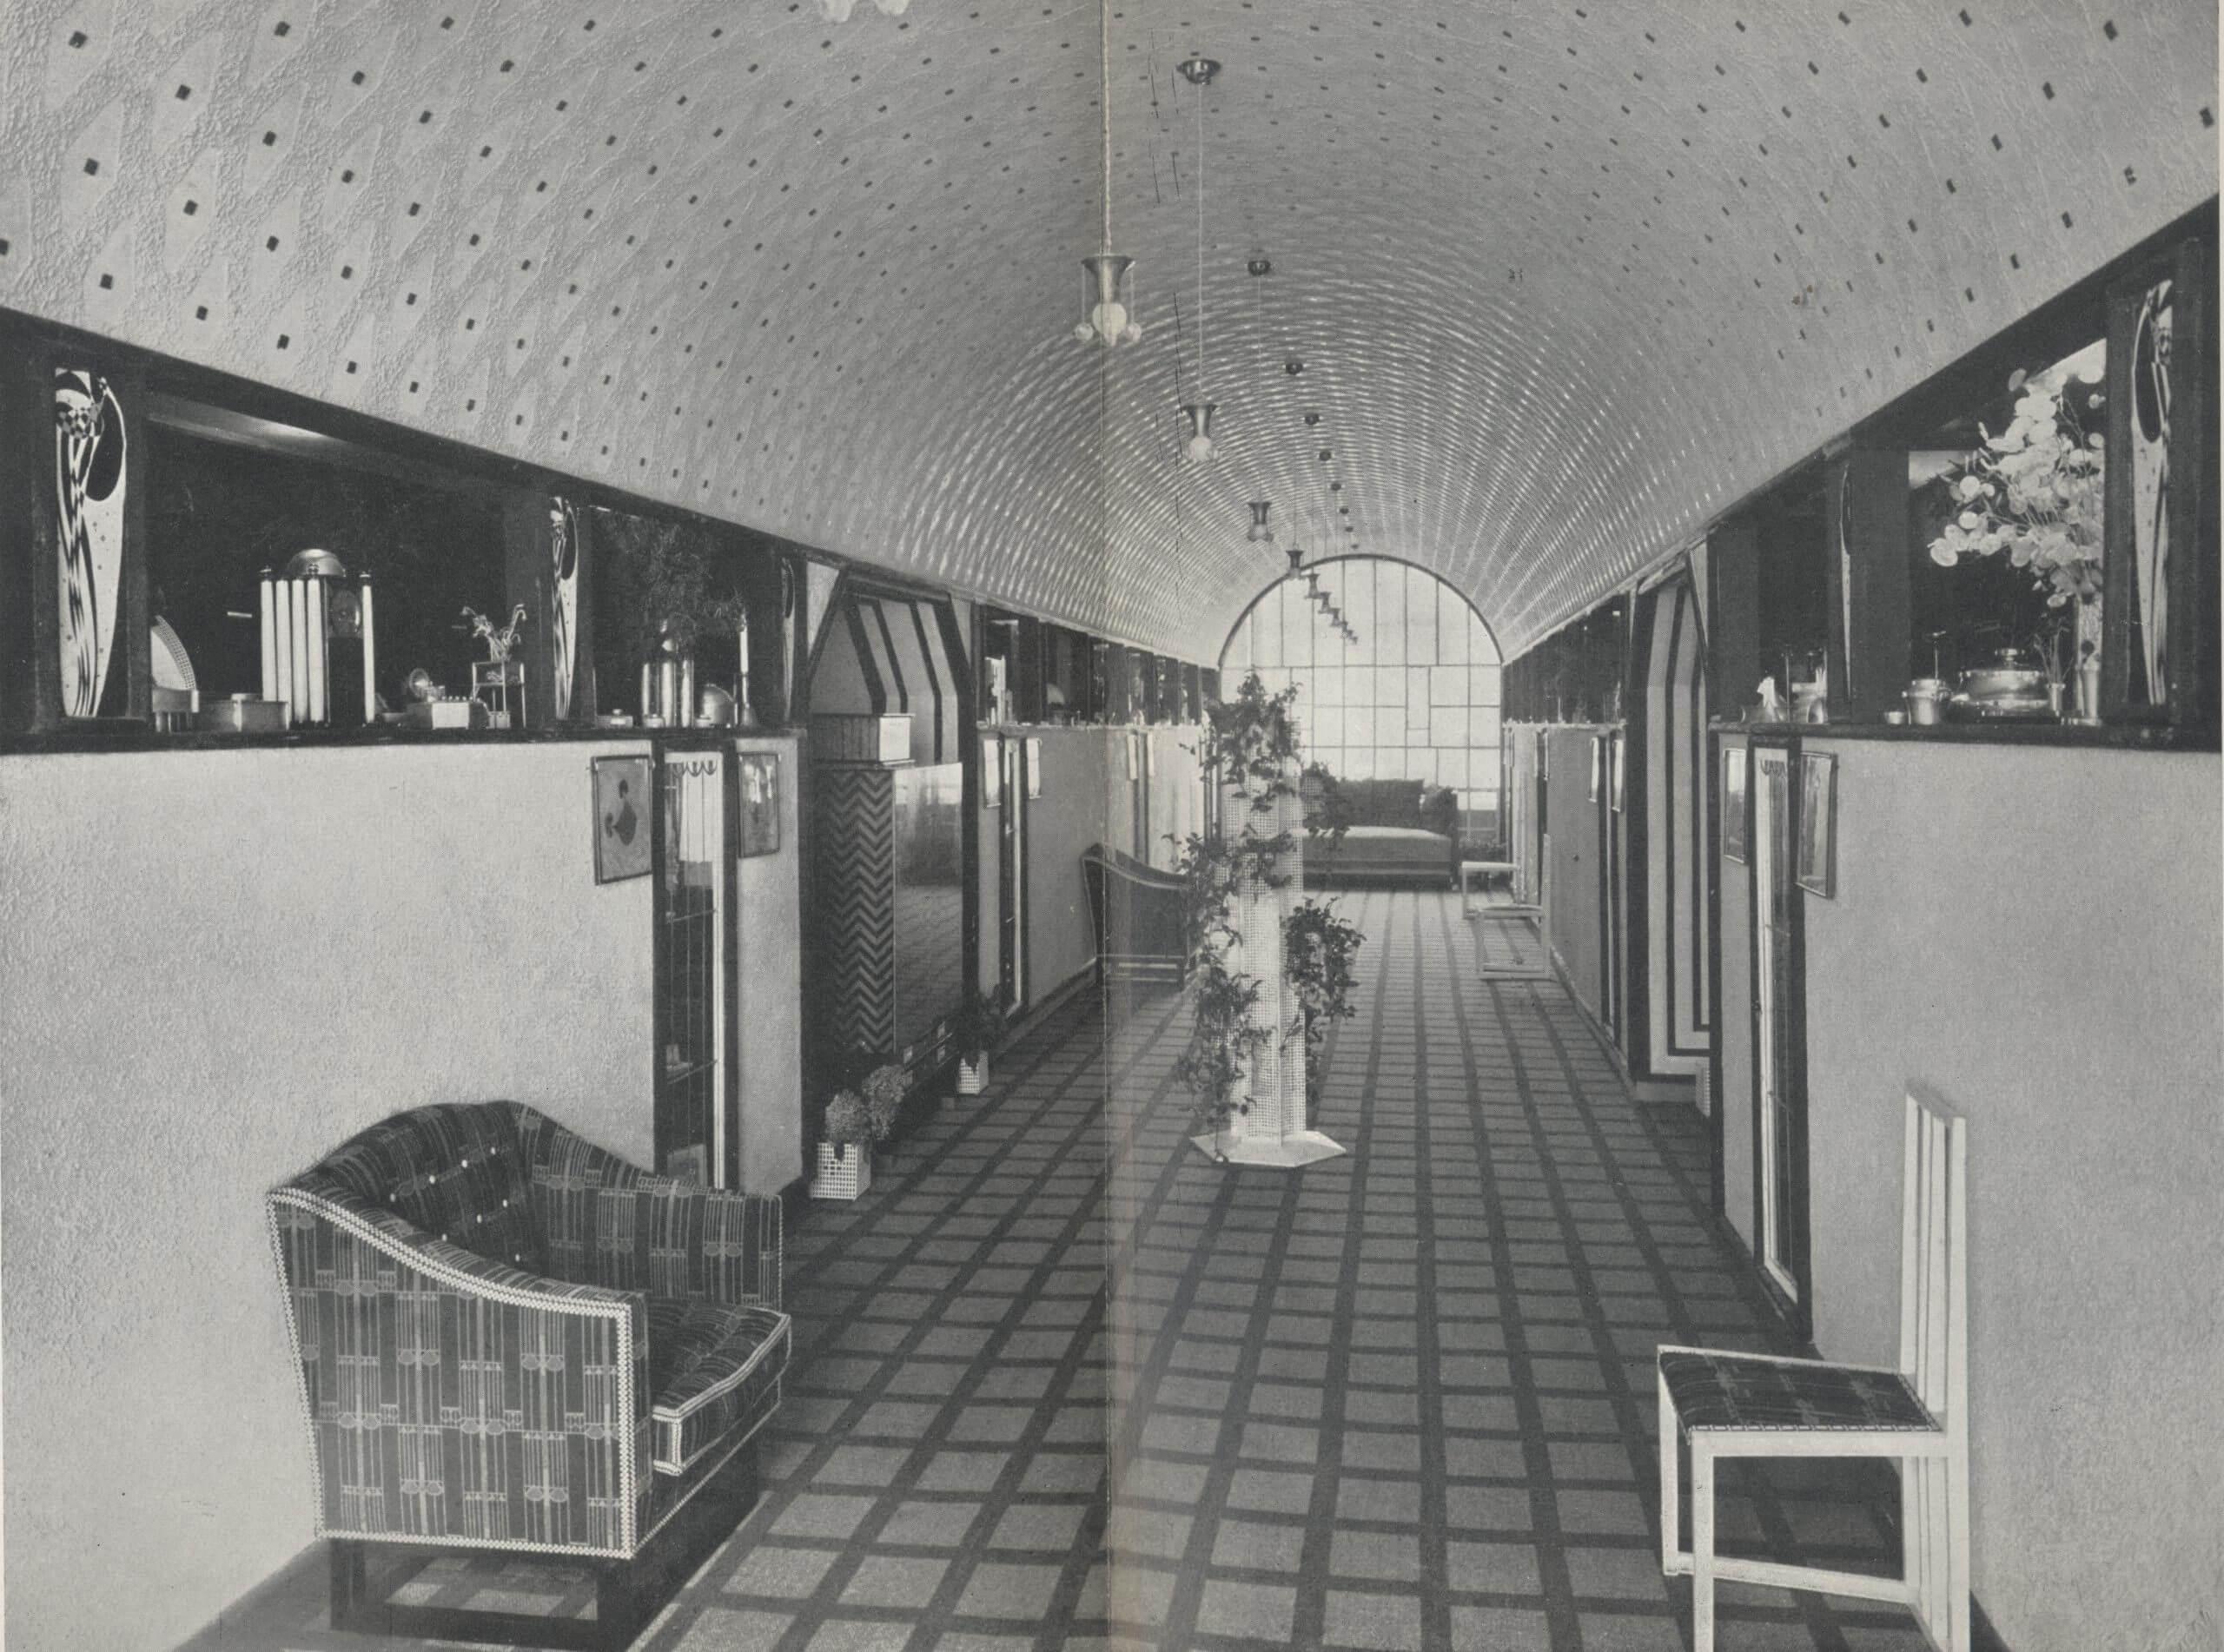 Exhibition of the Wiener Werkstätte, Berlin, 1904